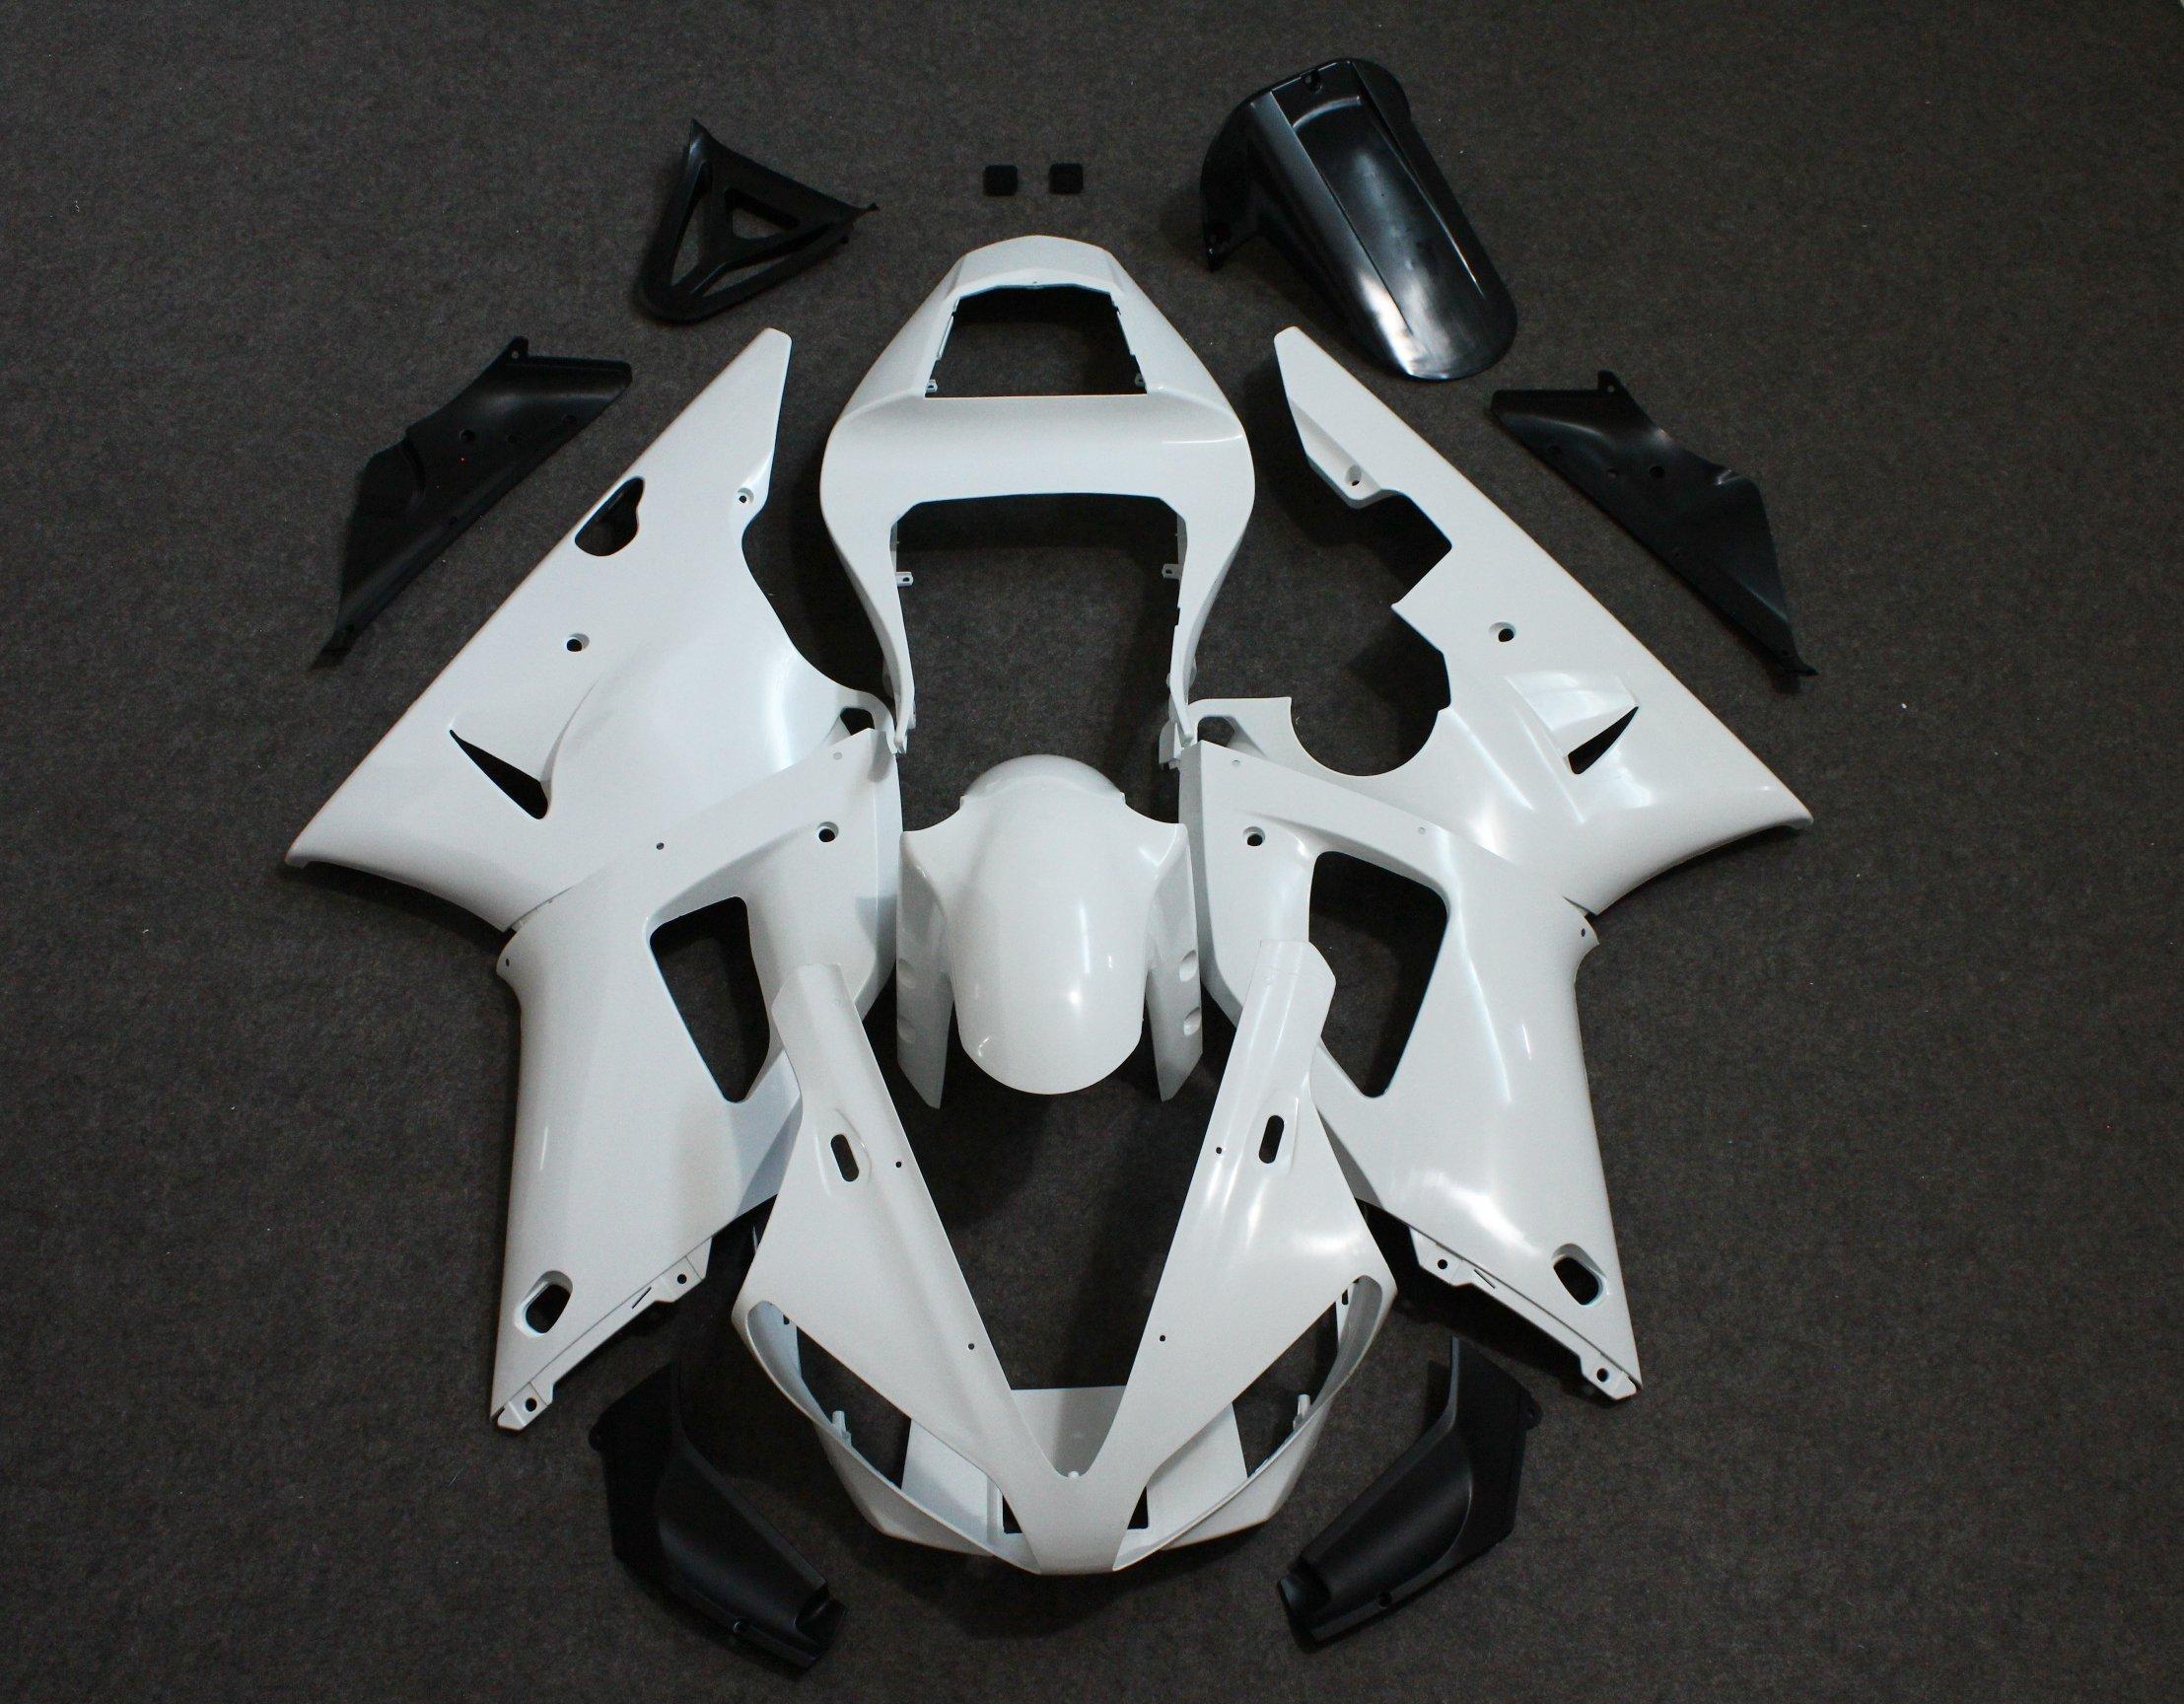 ZXMOTO Unpainted Fairing Kit for Yamaha YZF R1 (2000 - 2001)